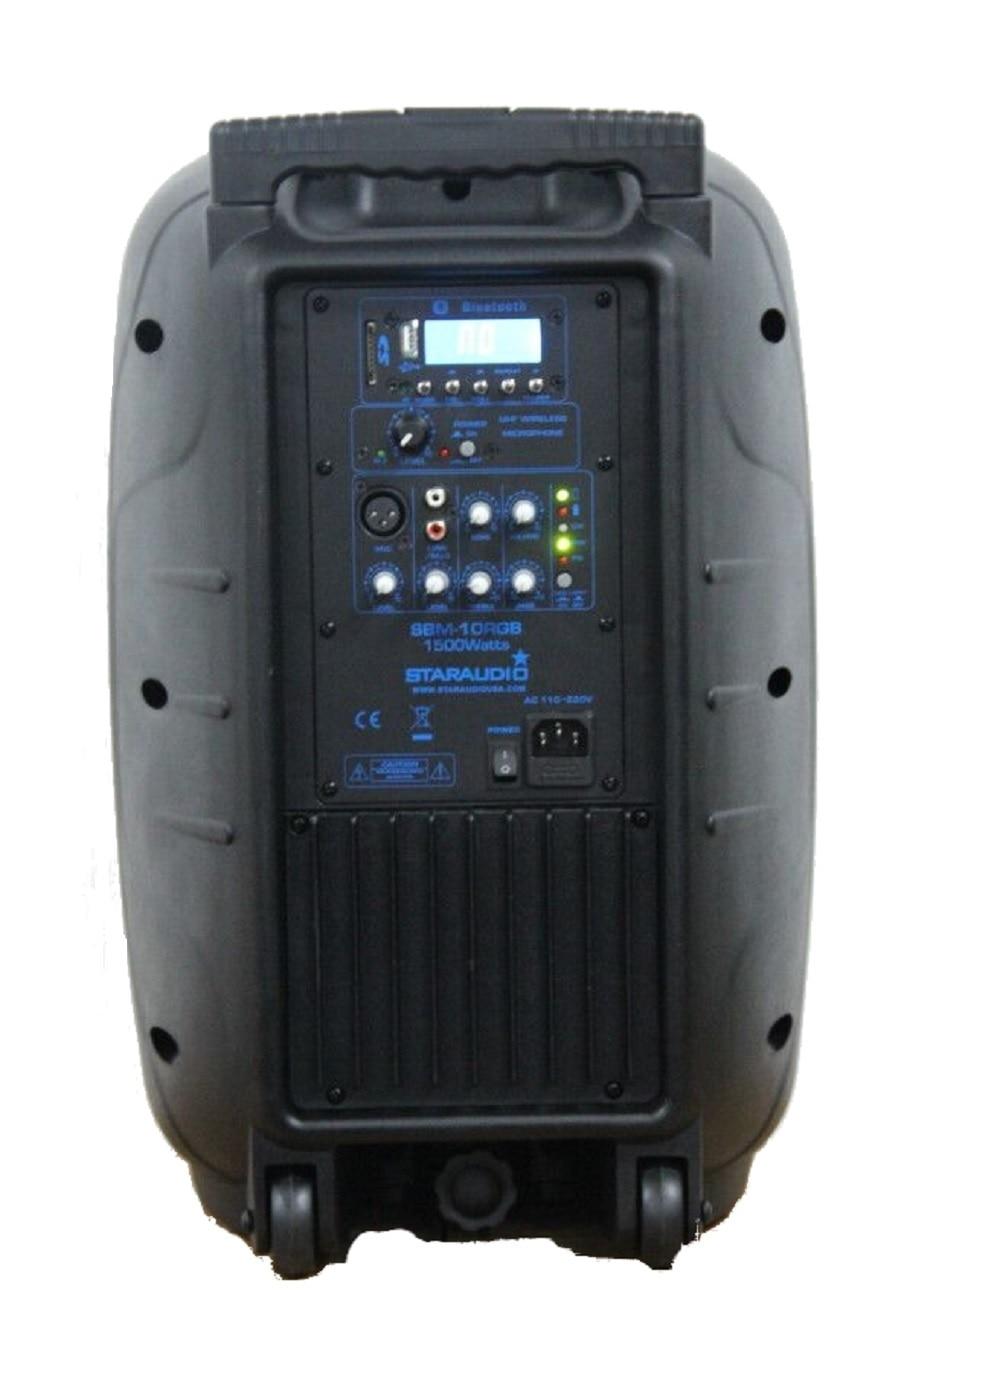 STARAUDIO 10″ 1500W Pro Active PA Recharge Battery LED RGB Lighting Bluetooth Speaker with 1 Mic SBM-10RGB